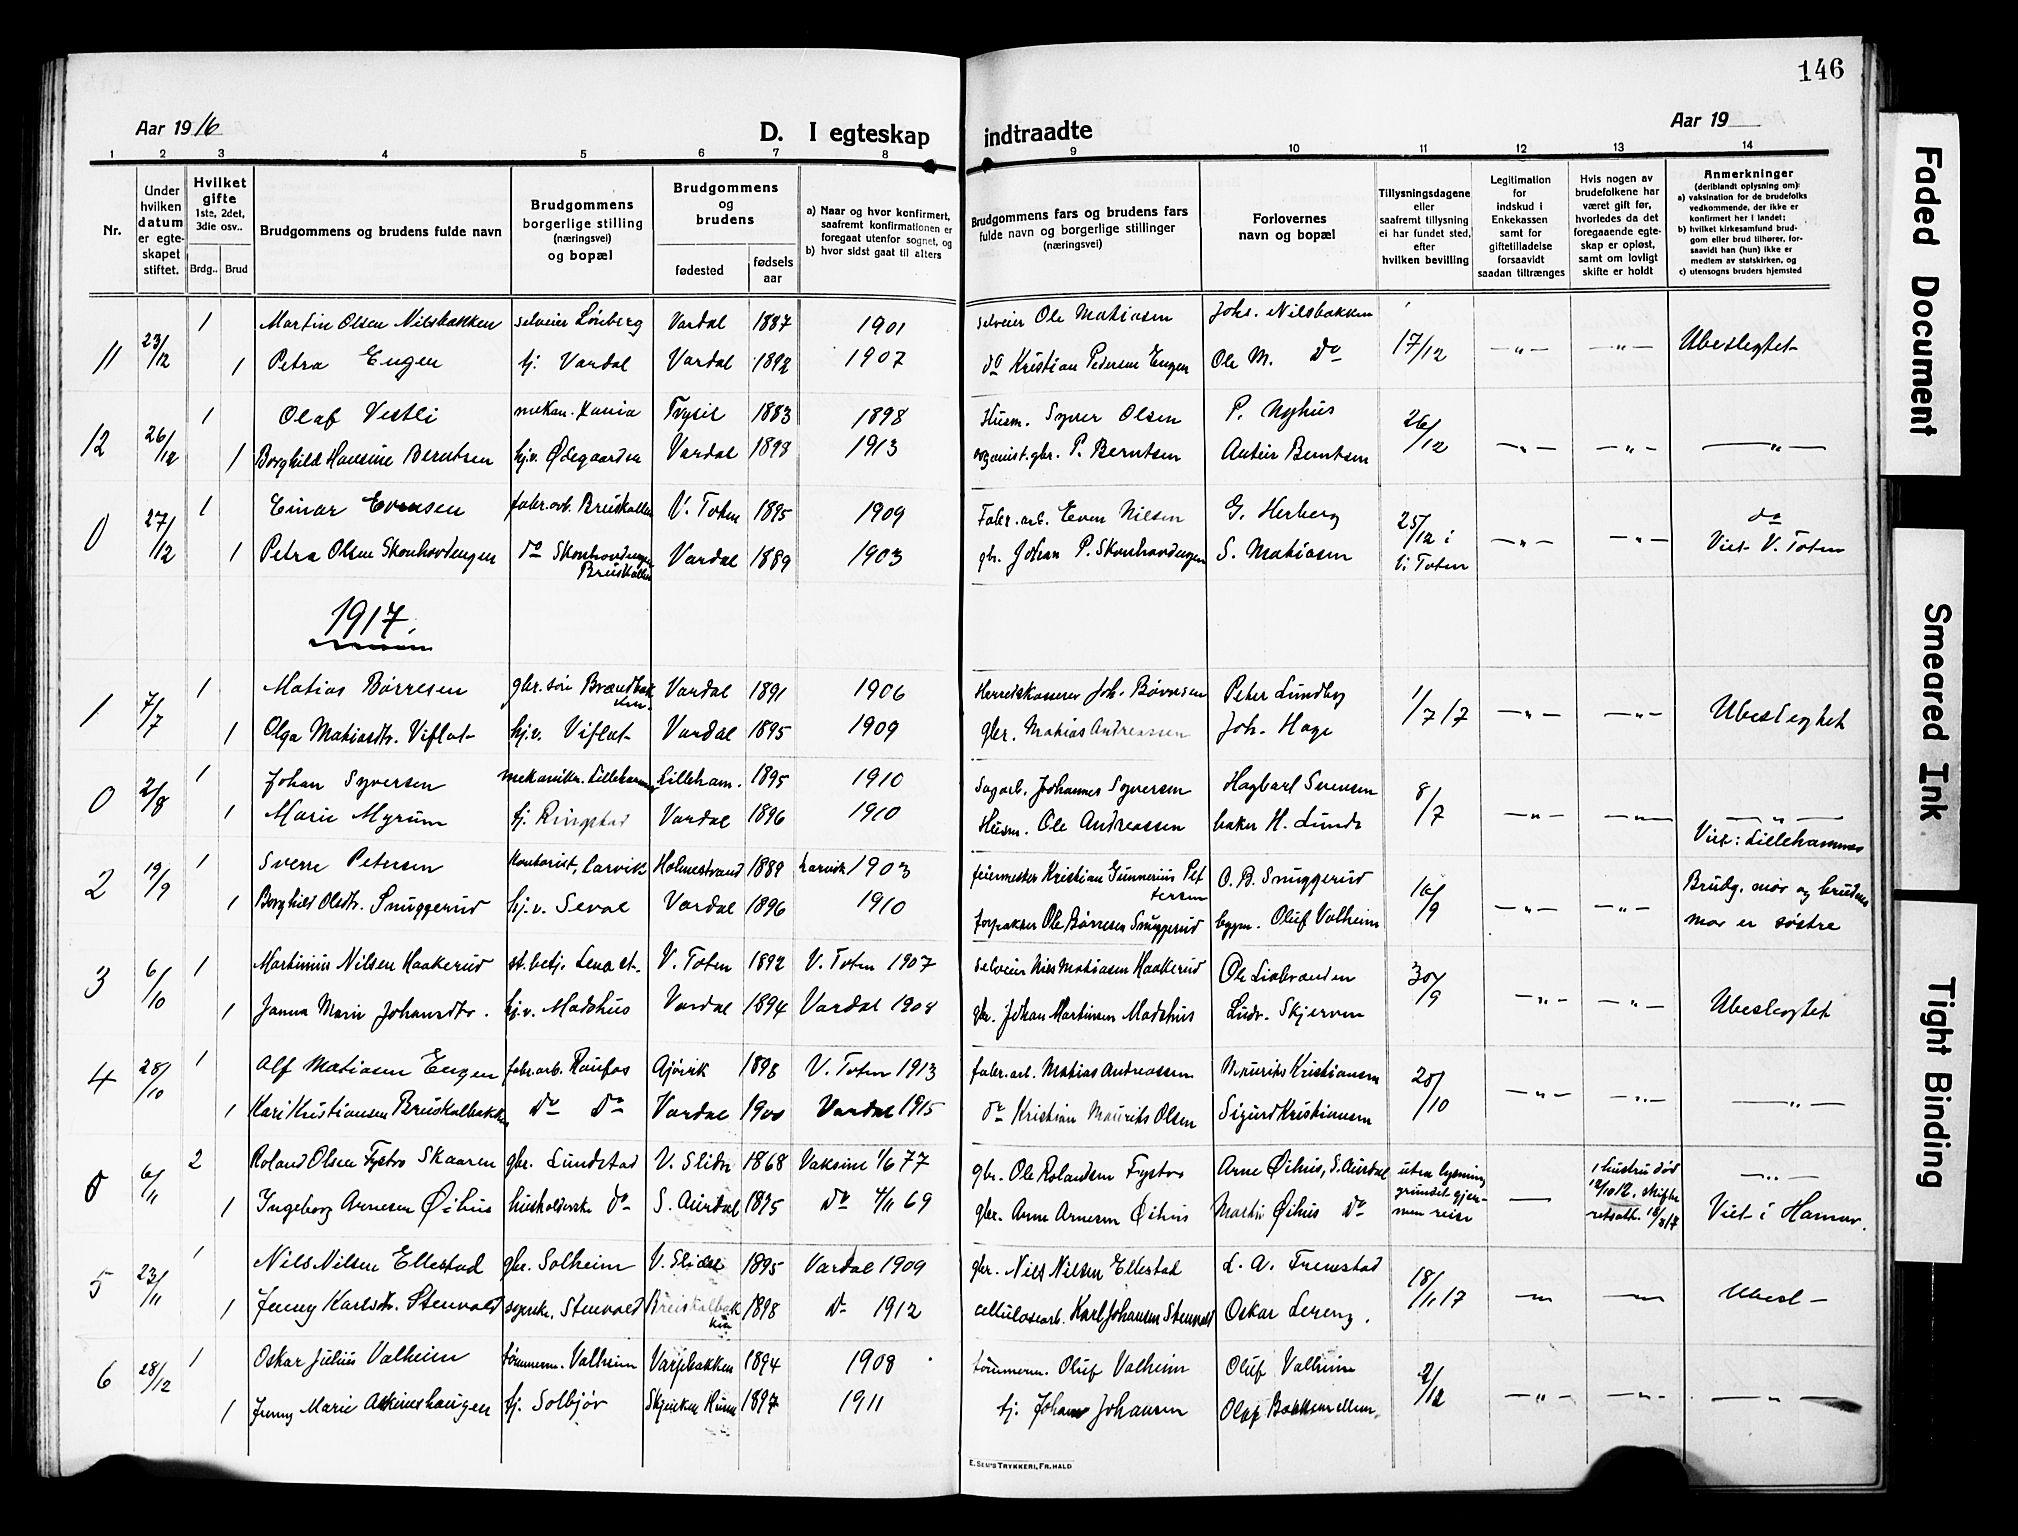 SAH, Vardal prestekontor, H/Ha/Hab/L0015: Klokkerbok nr. 15, 1914-1931, s. 146